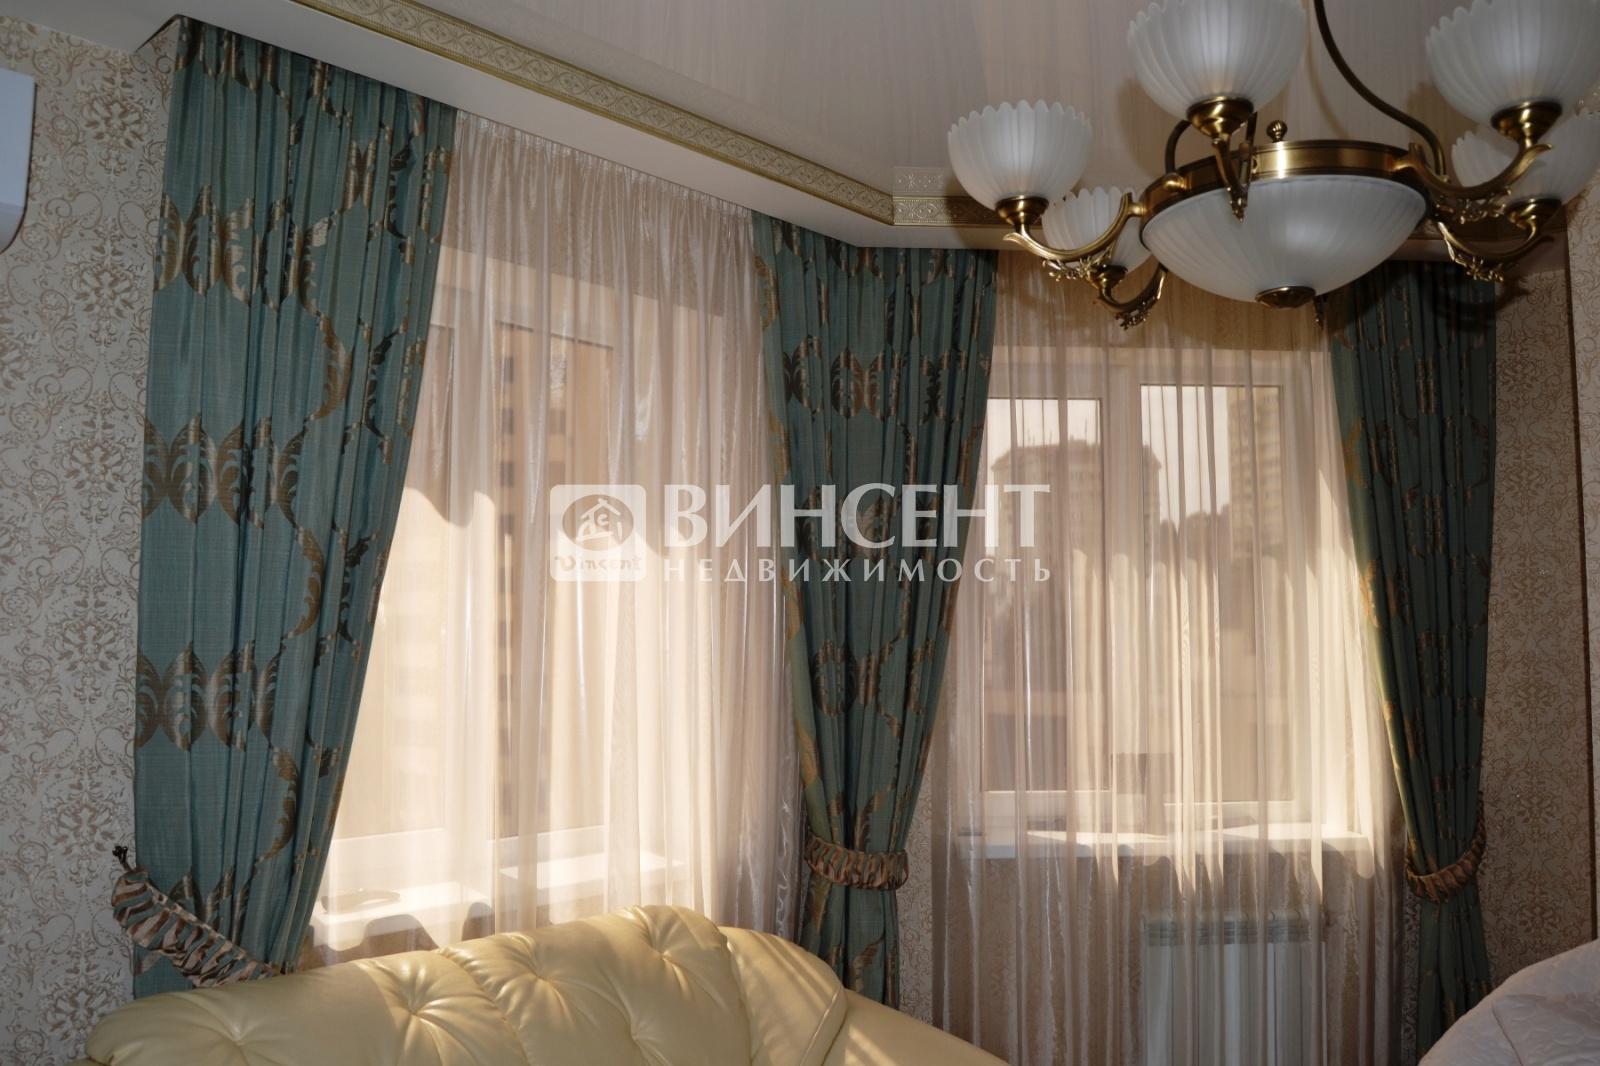 Компаньон  агентство недвижимости Челябинска Агентства